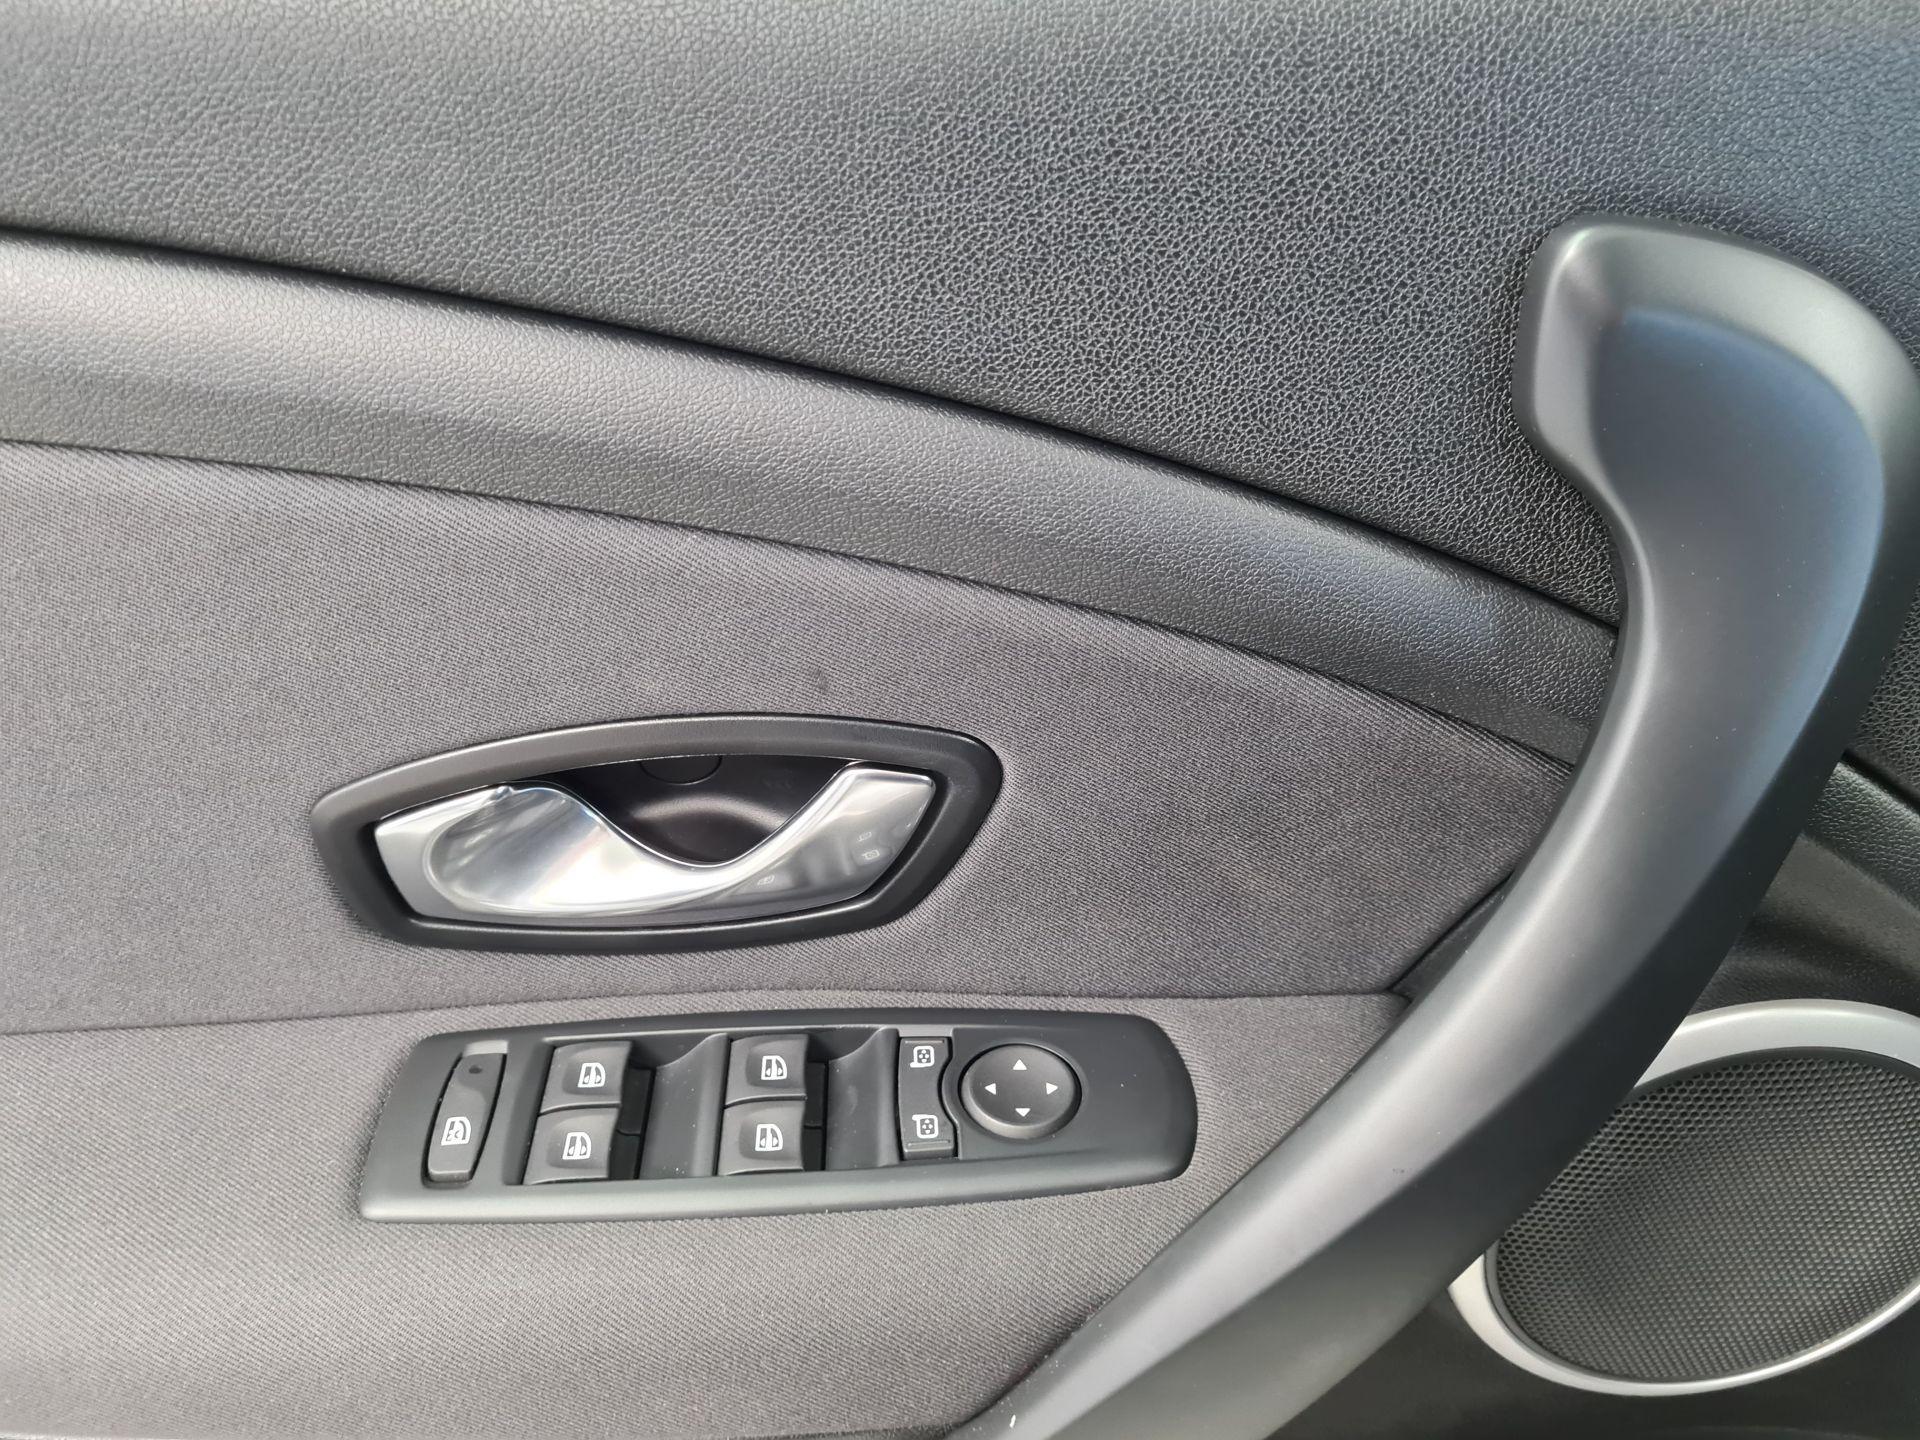 Renault Megane Bose Edition dCi 130 E5